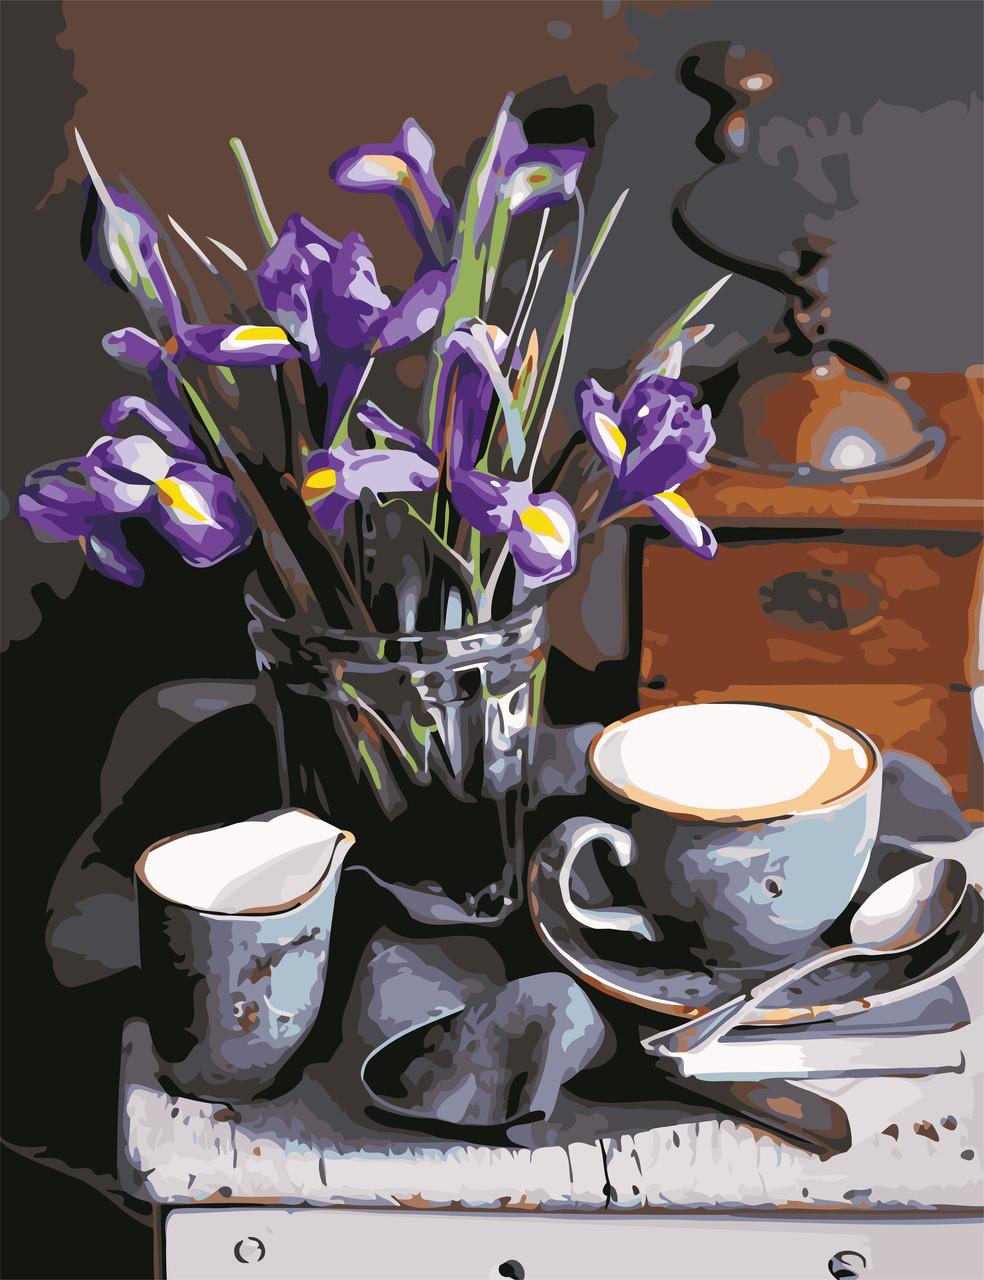 Картина по номерам Кофе и ирисы 50 х 65 см (AS0631)